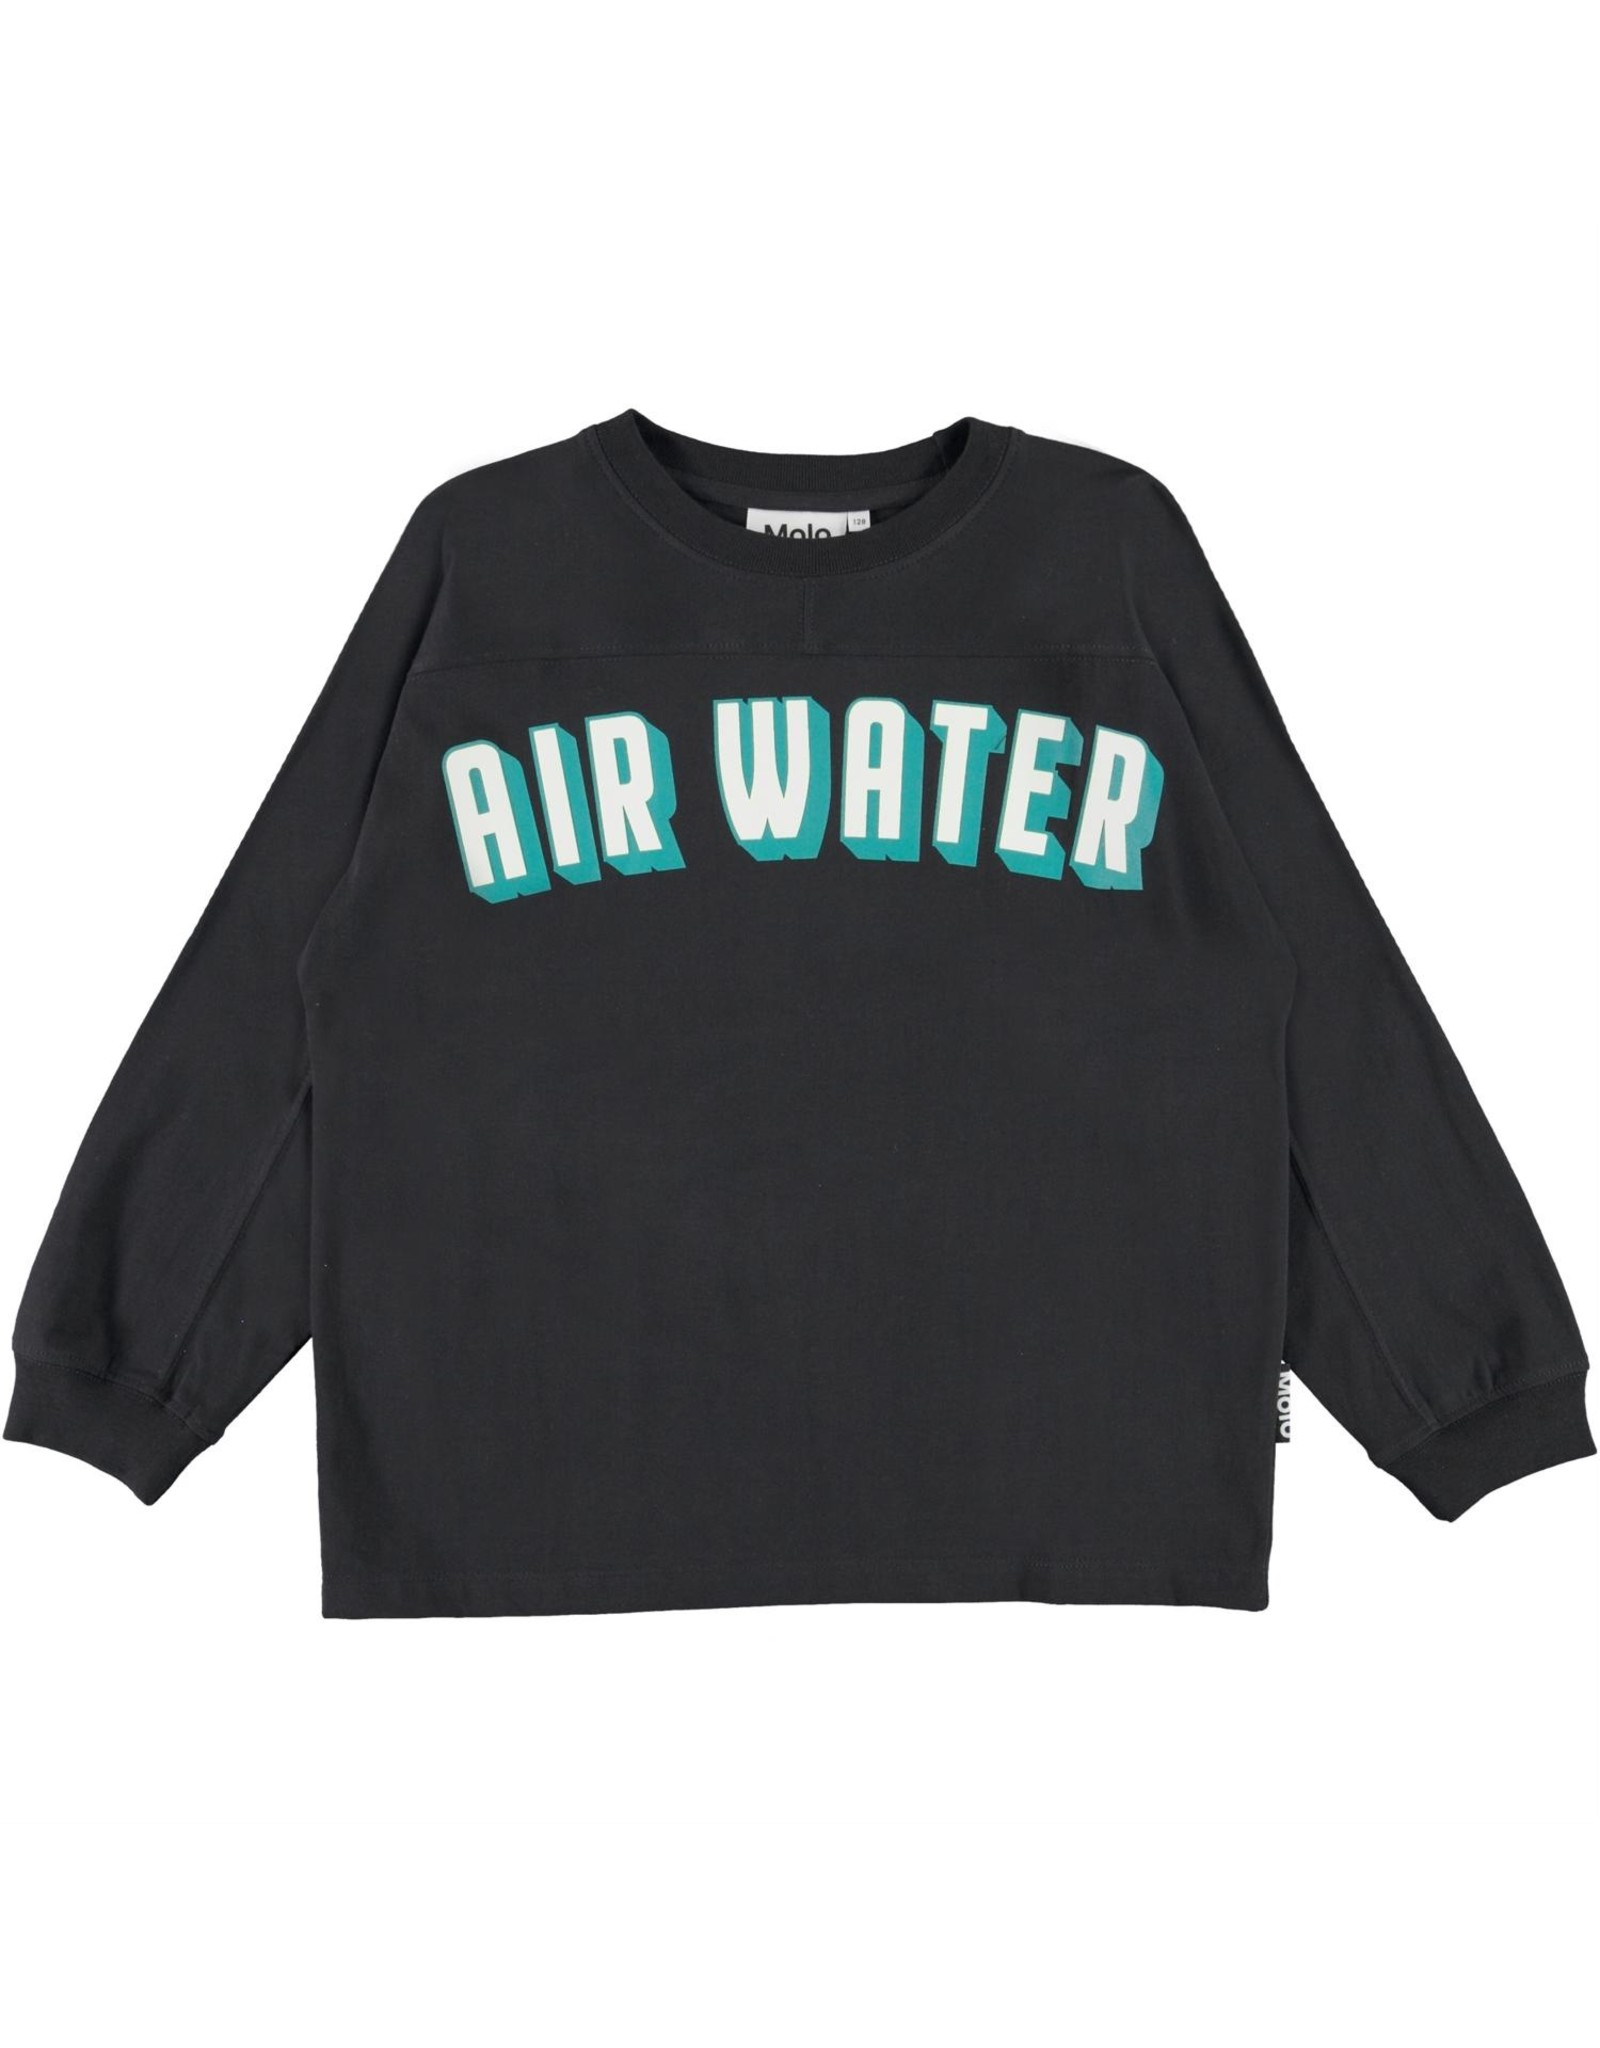 Molo Molo Rhon Sweater T-shirt Black